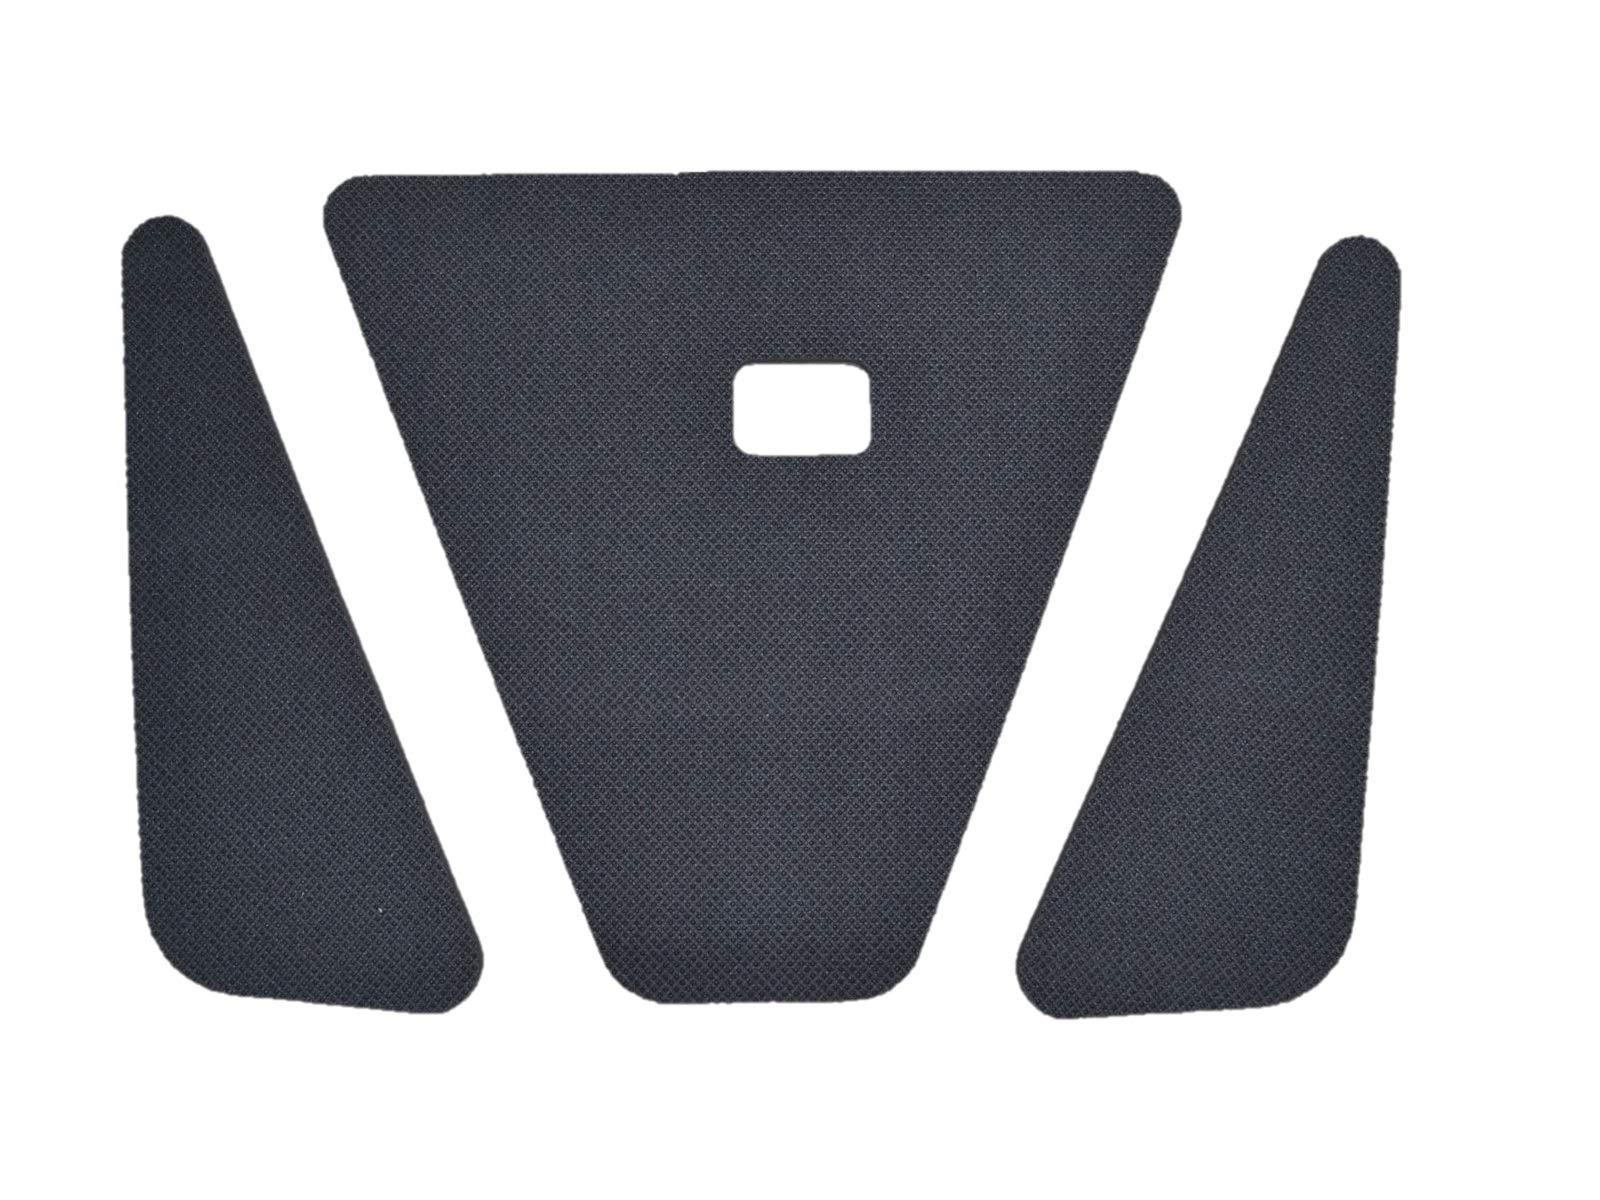 black Carparts-Online GmbH 27860 front bumper spoiler IS style